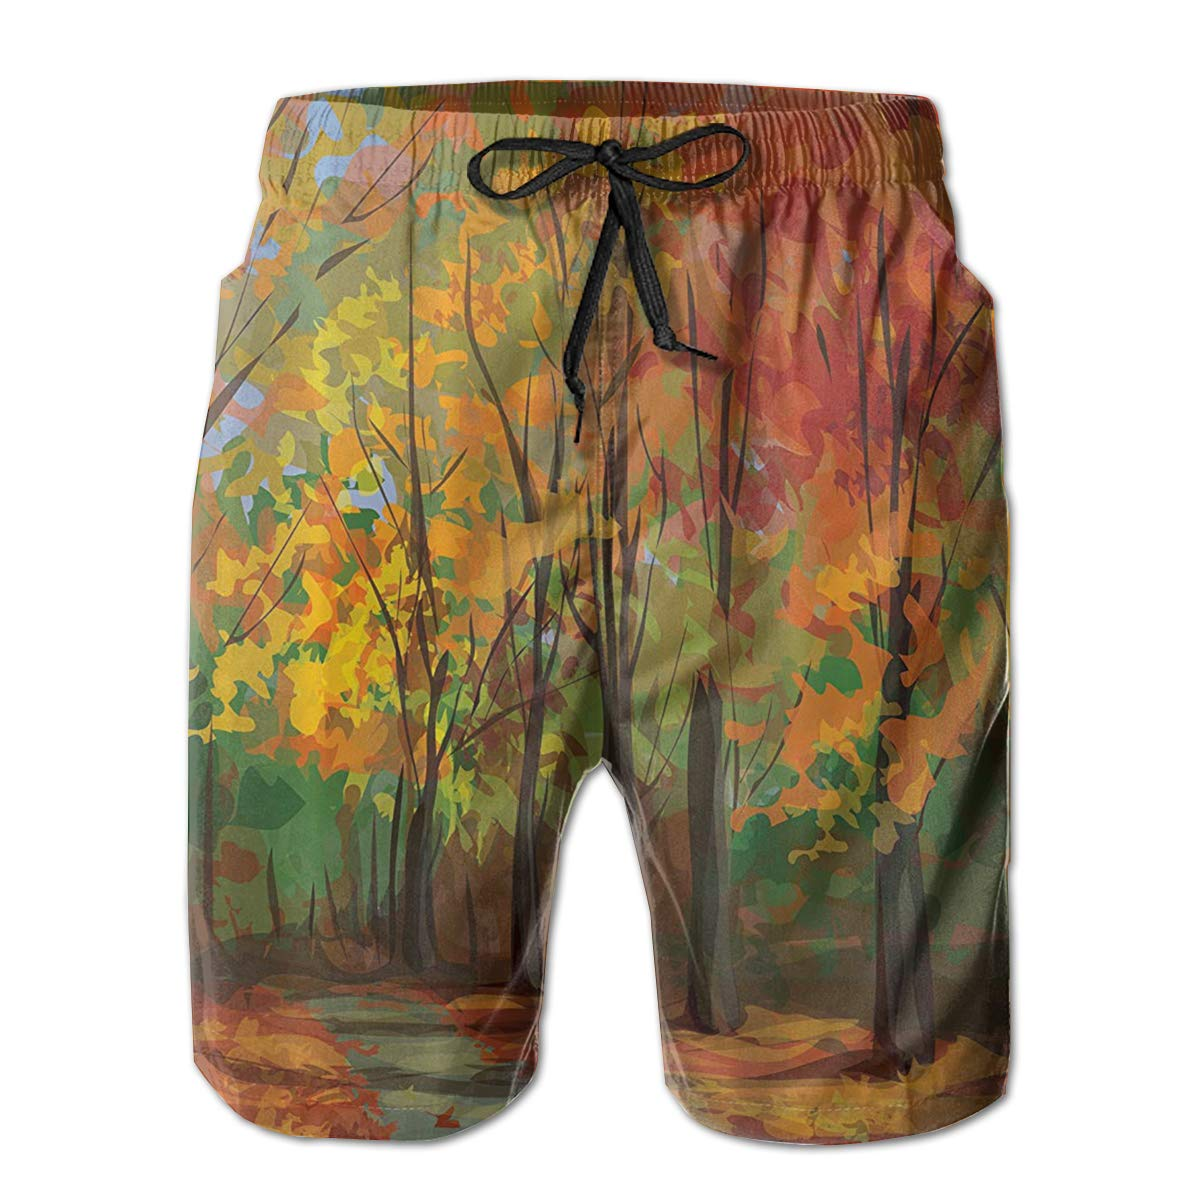 Bilybily Falling Leaves Fall Mens Swim Trunks Quick Dry Board Shorts with Pockets Summer Beach Shorts